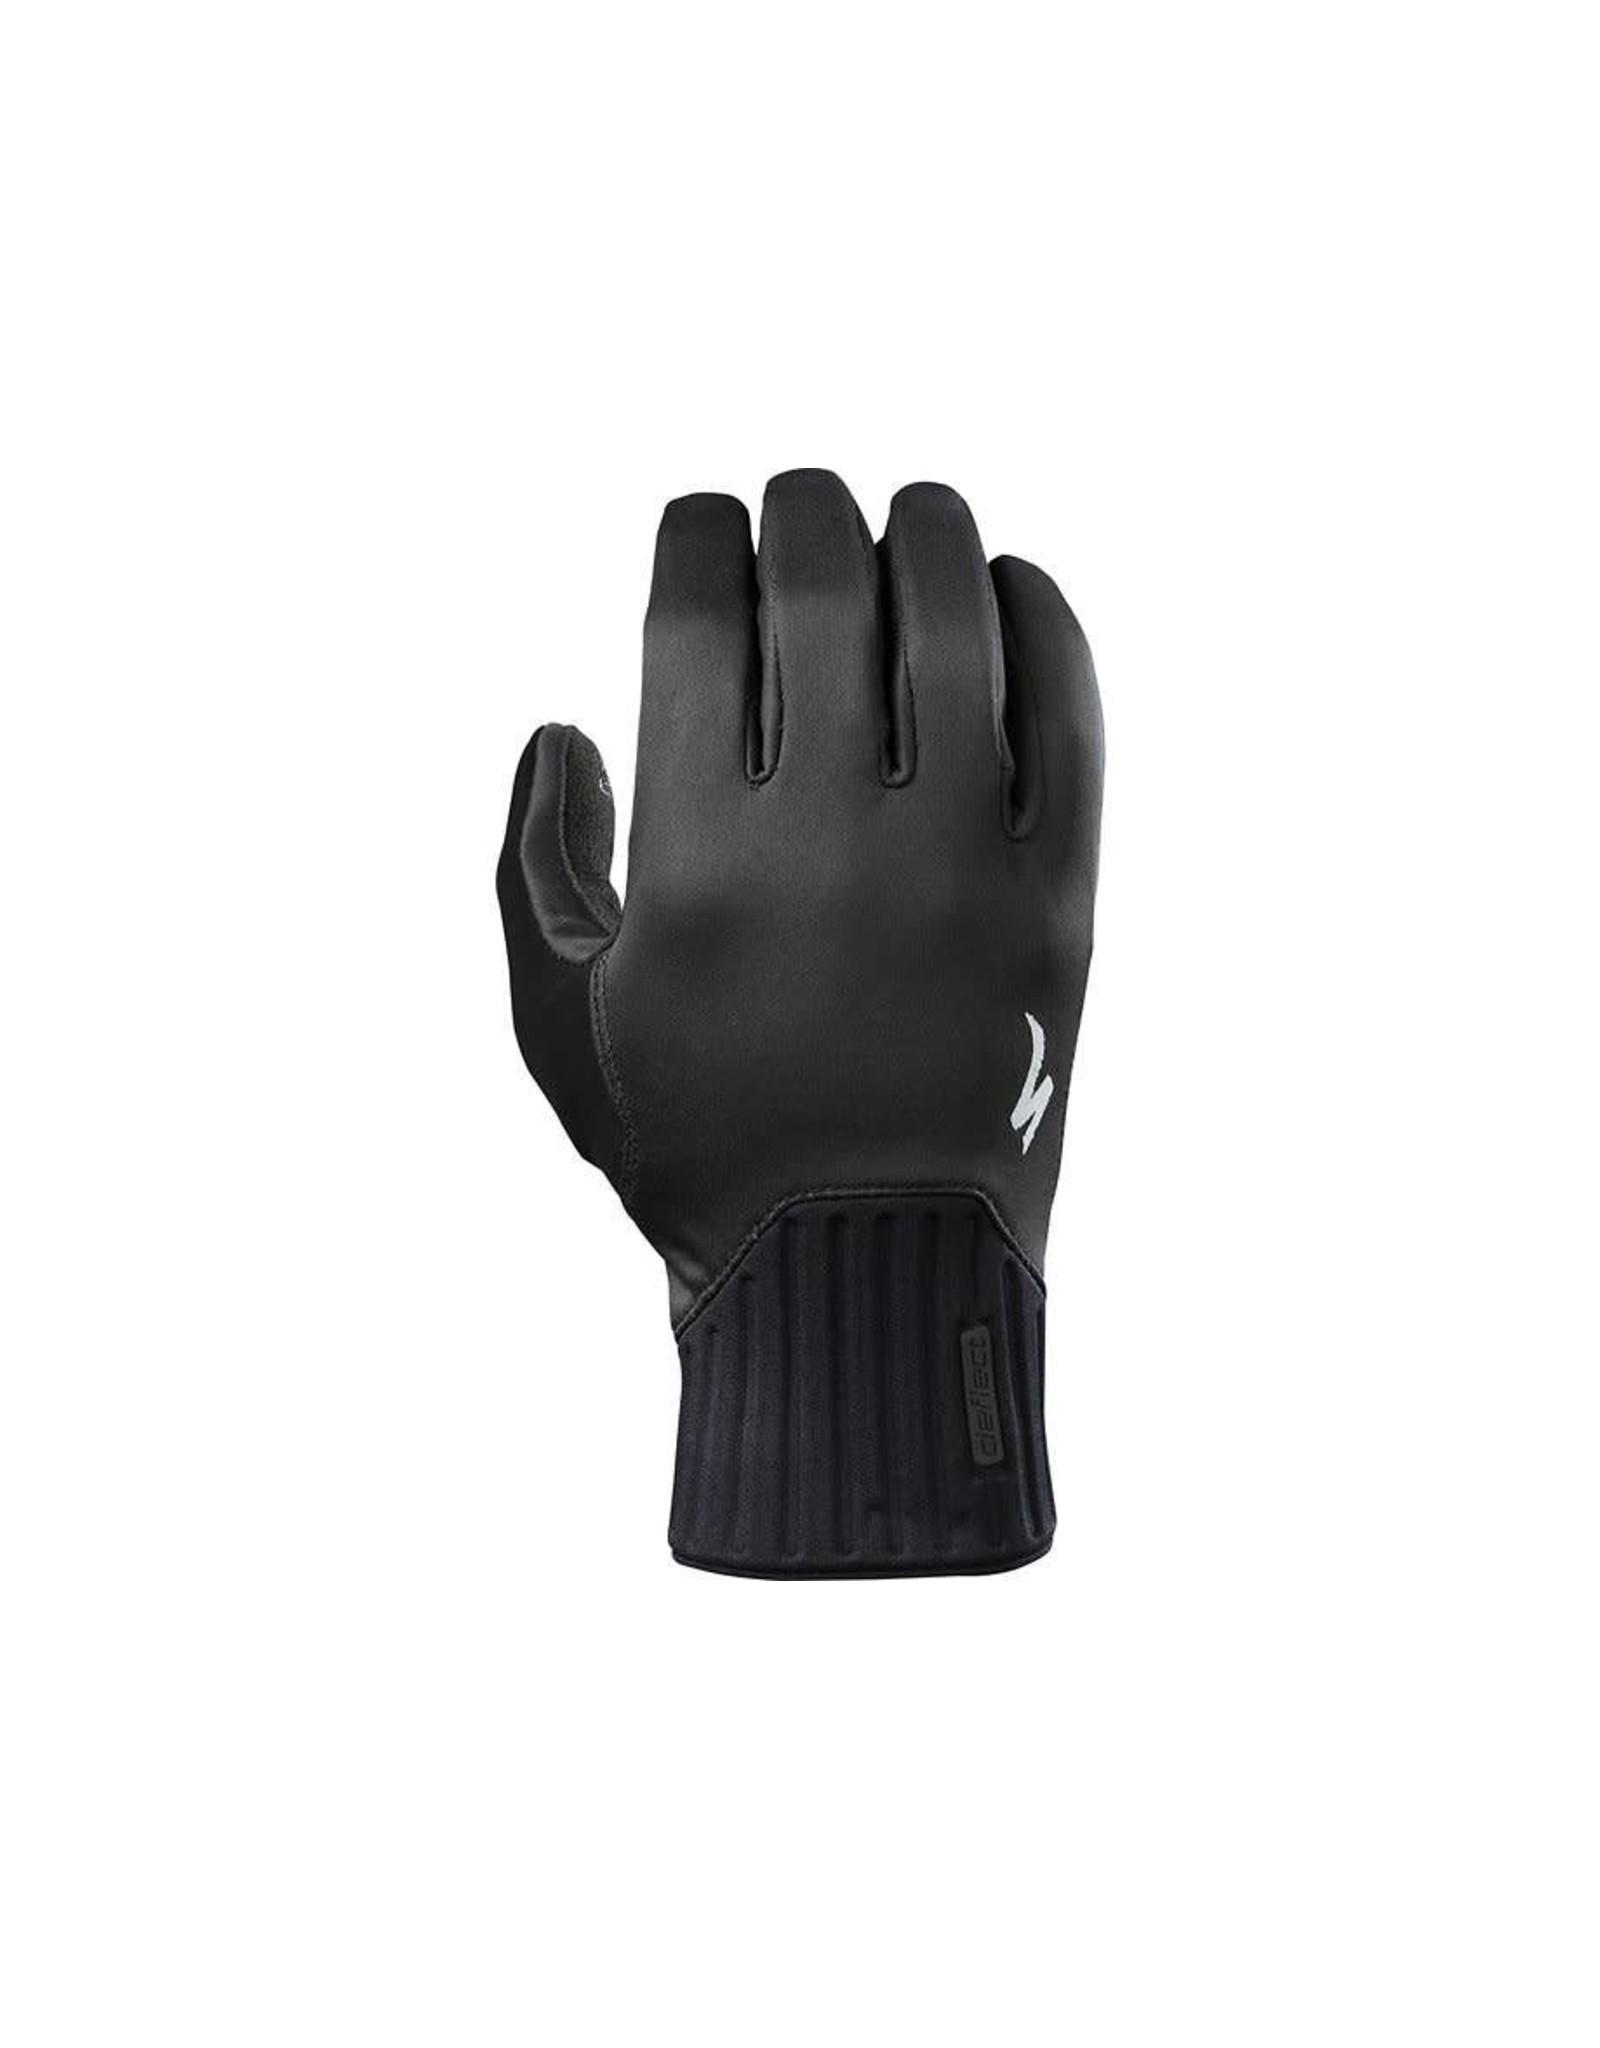 SPECIALIZED Specialized Deflect Glove - Black - Small